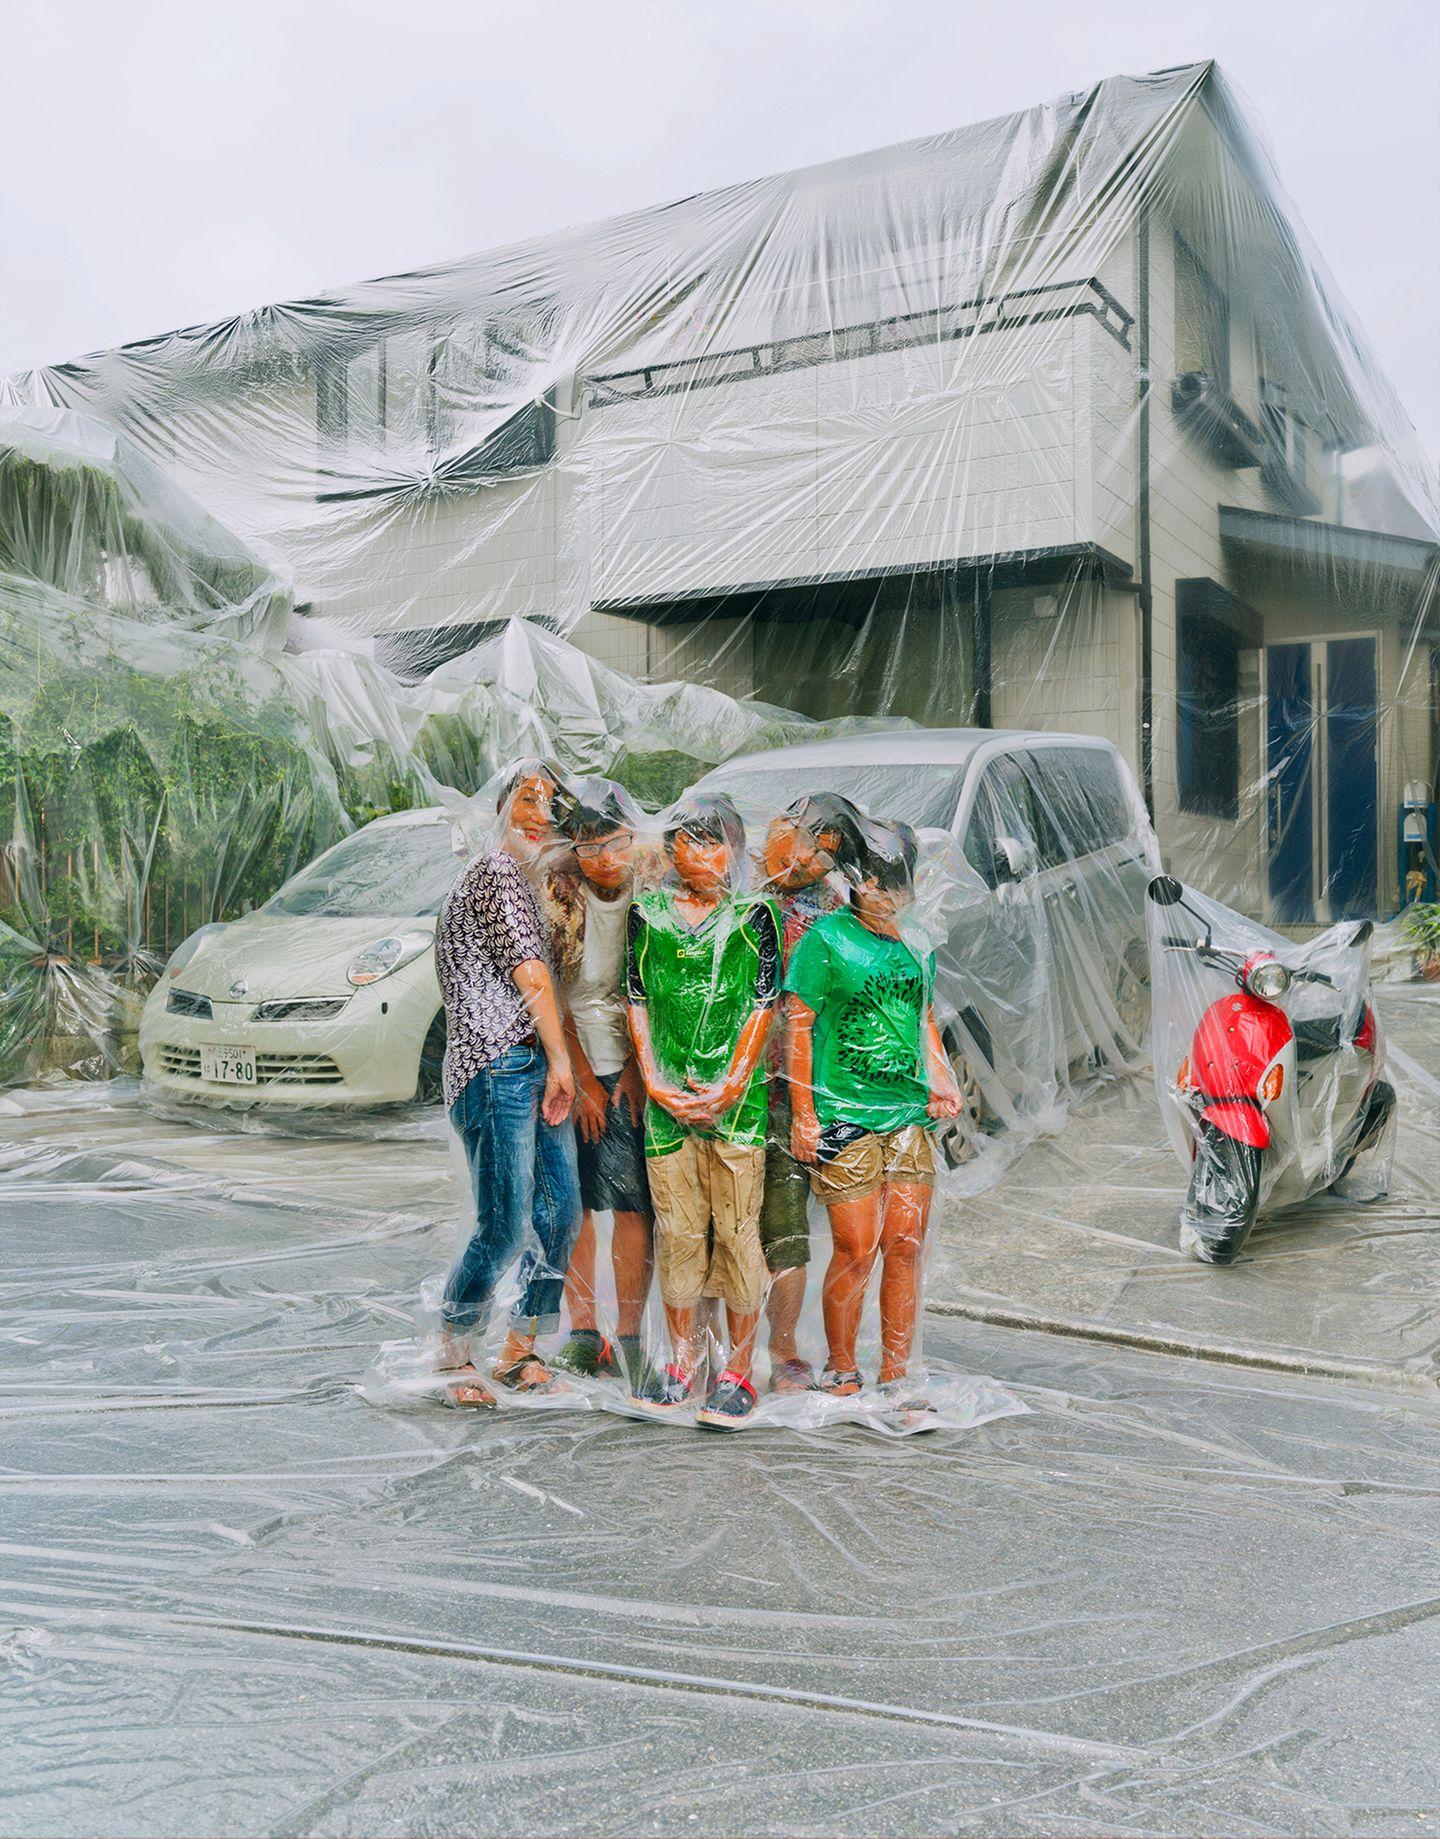 Art Photography Award: Familie umwickelt mit Folie